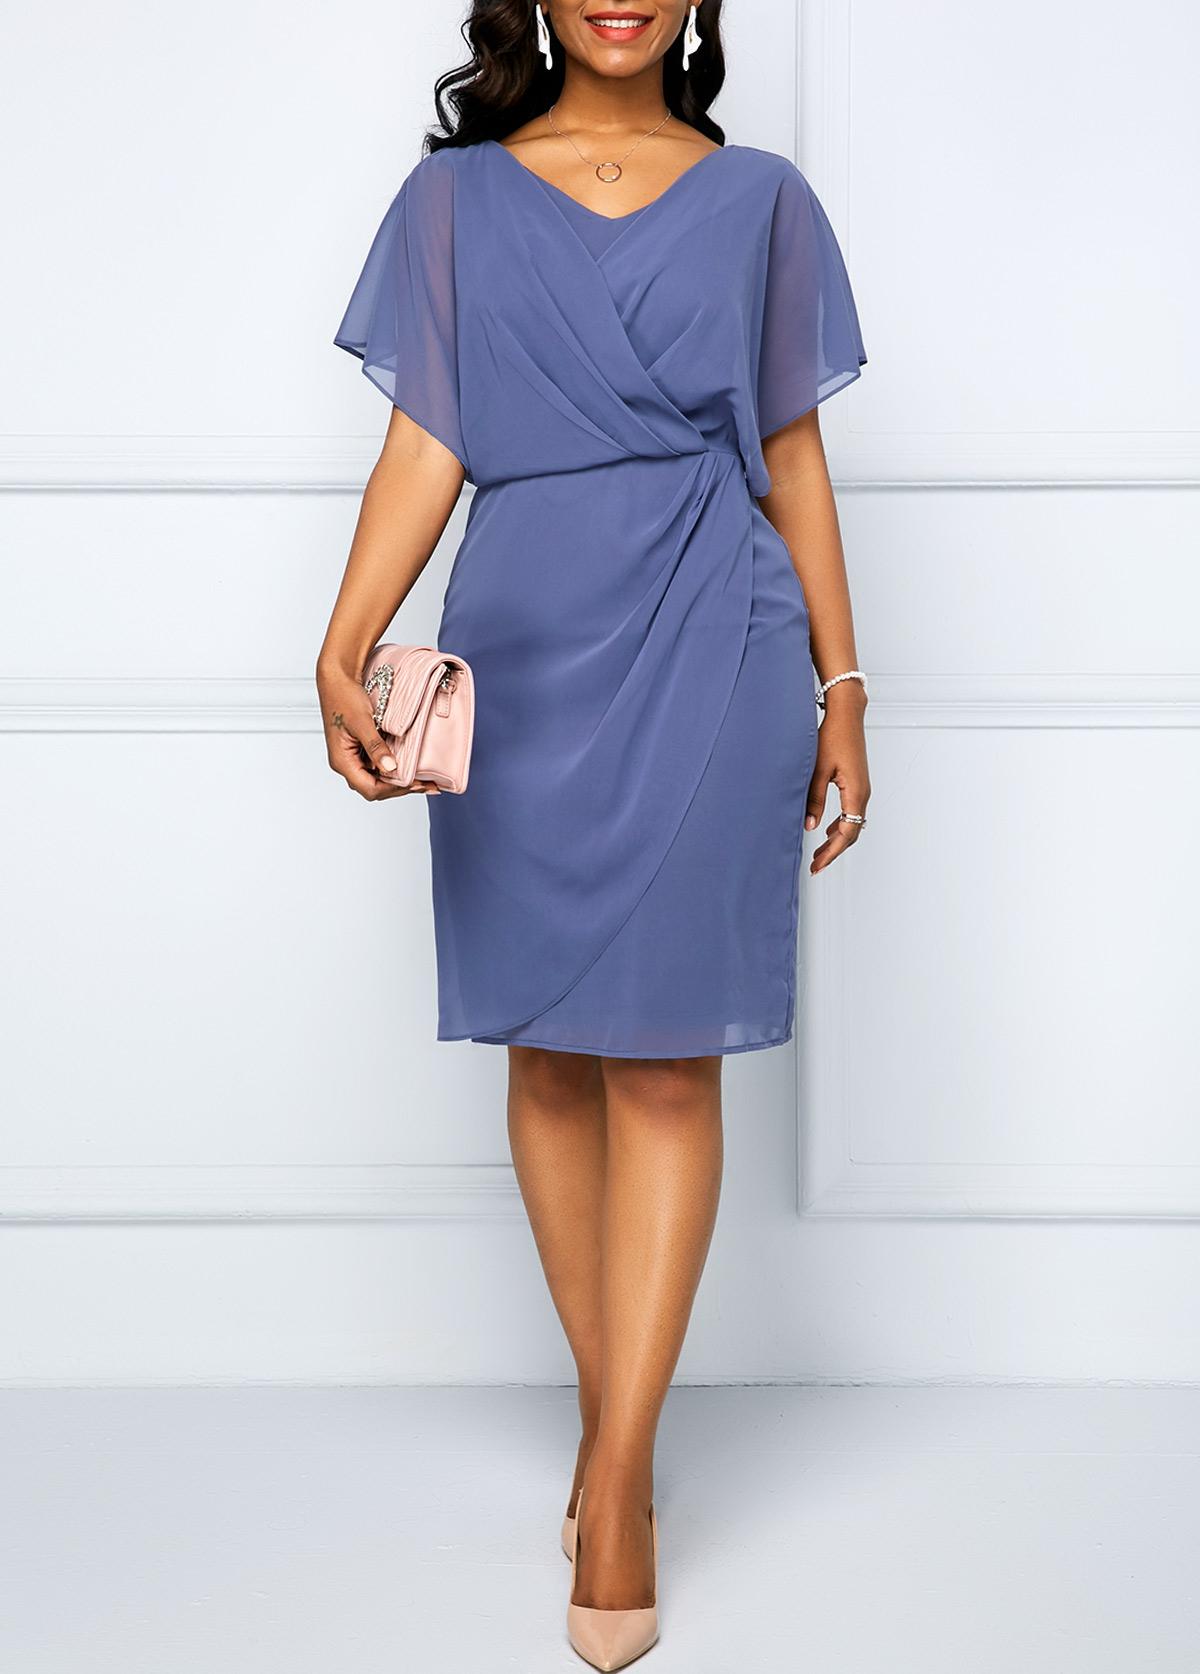 ROTITA Dusty Blue Cape Shoulder Draped Surplice Chiffon Dress